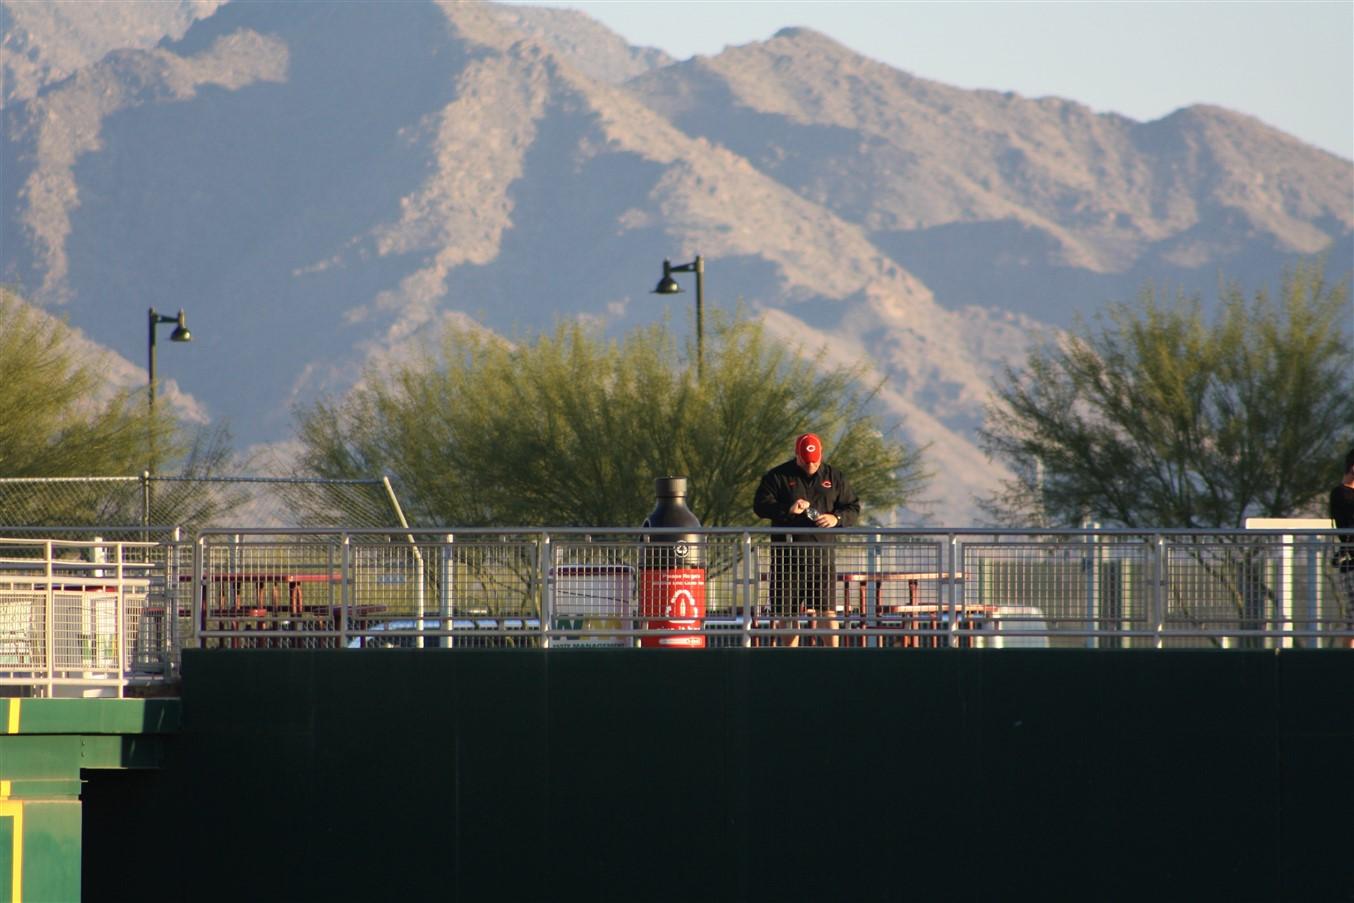 2012 03 16 137 Goodyear AZ Spring Training Game.jpg